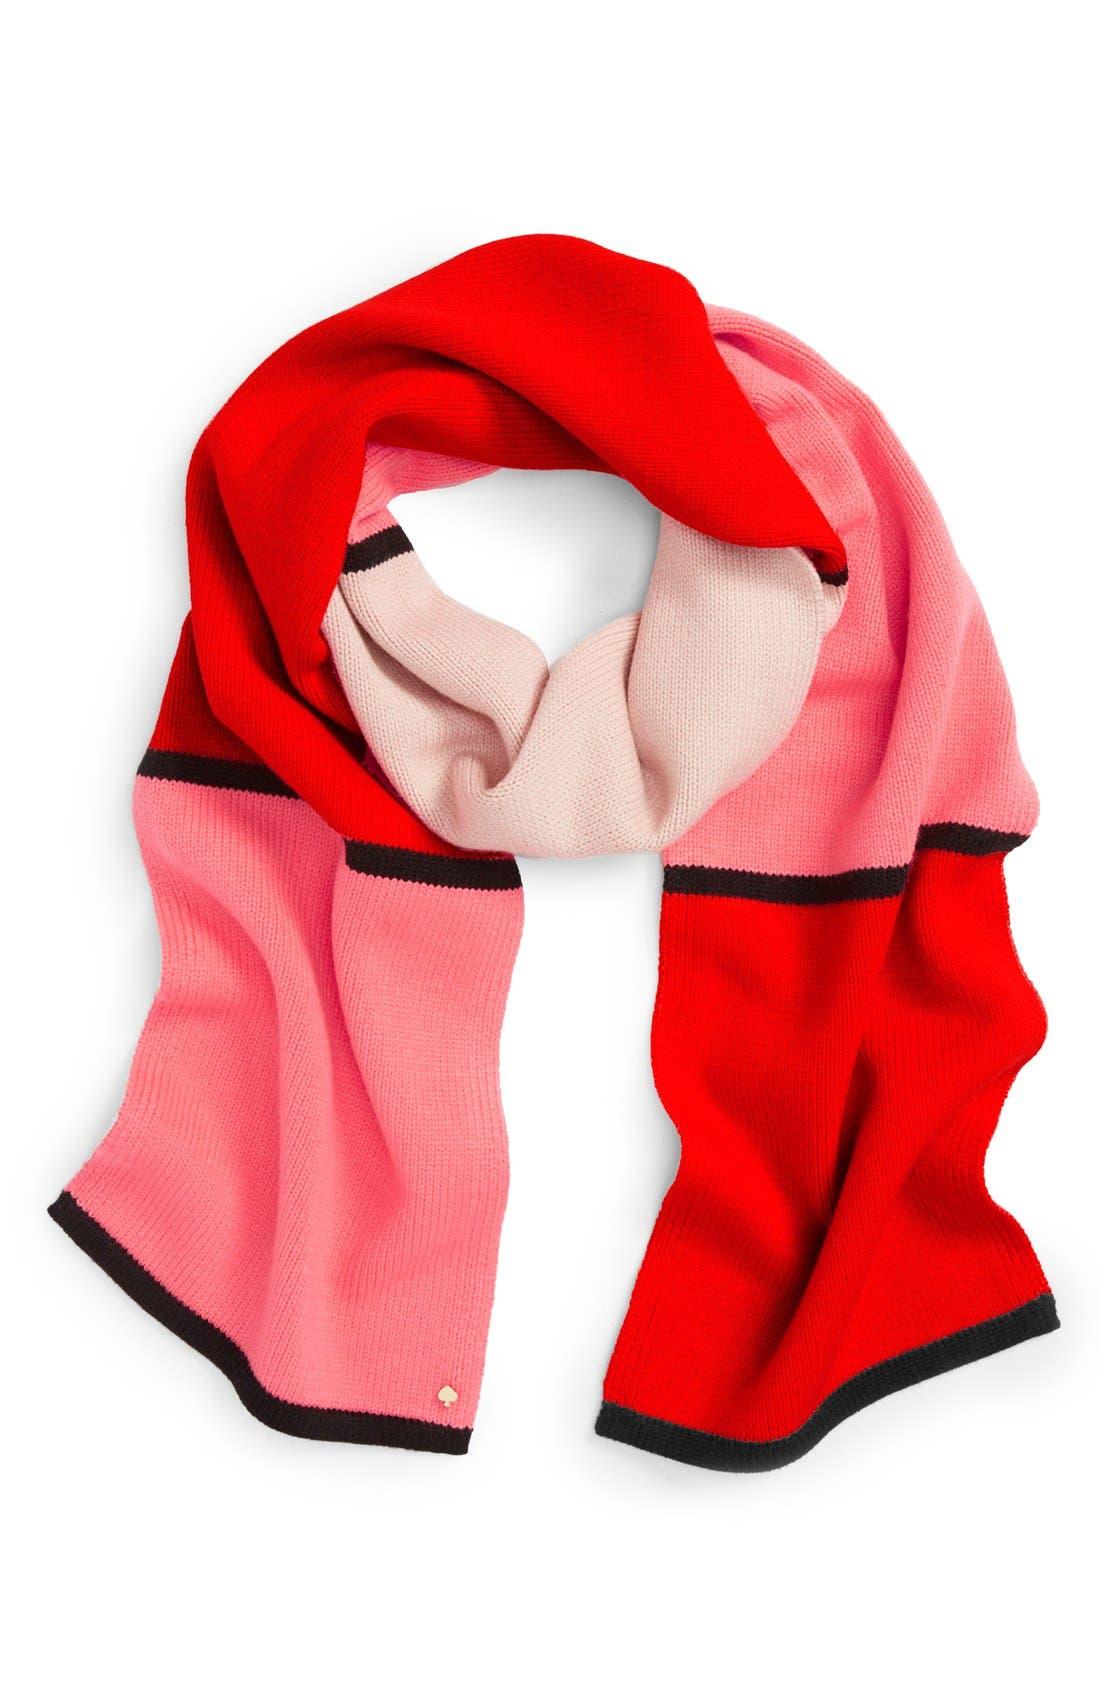 Alternate Image 1 Selected - kate spade new york mondarian colorblock scarf